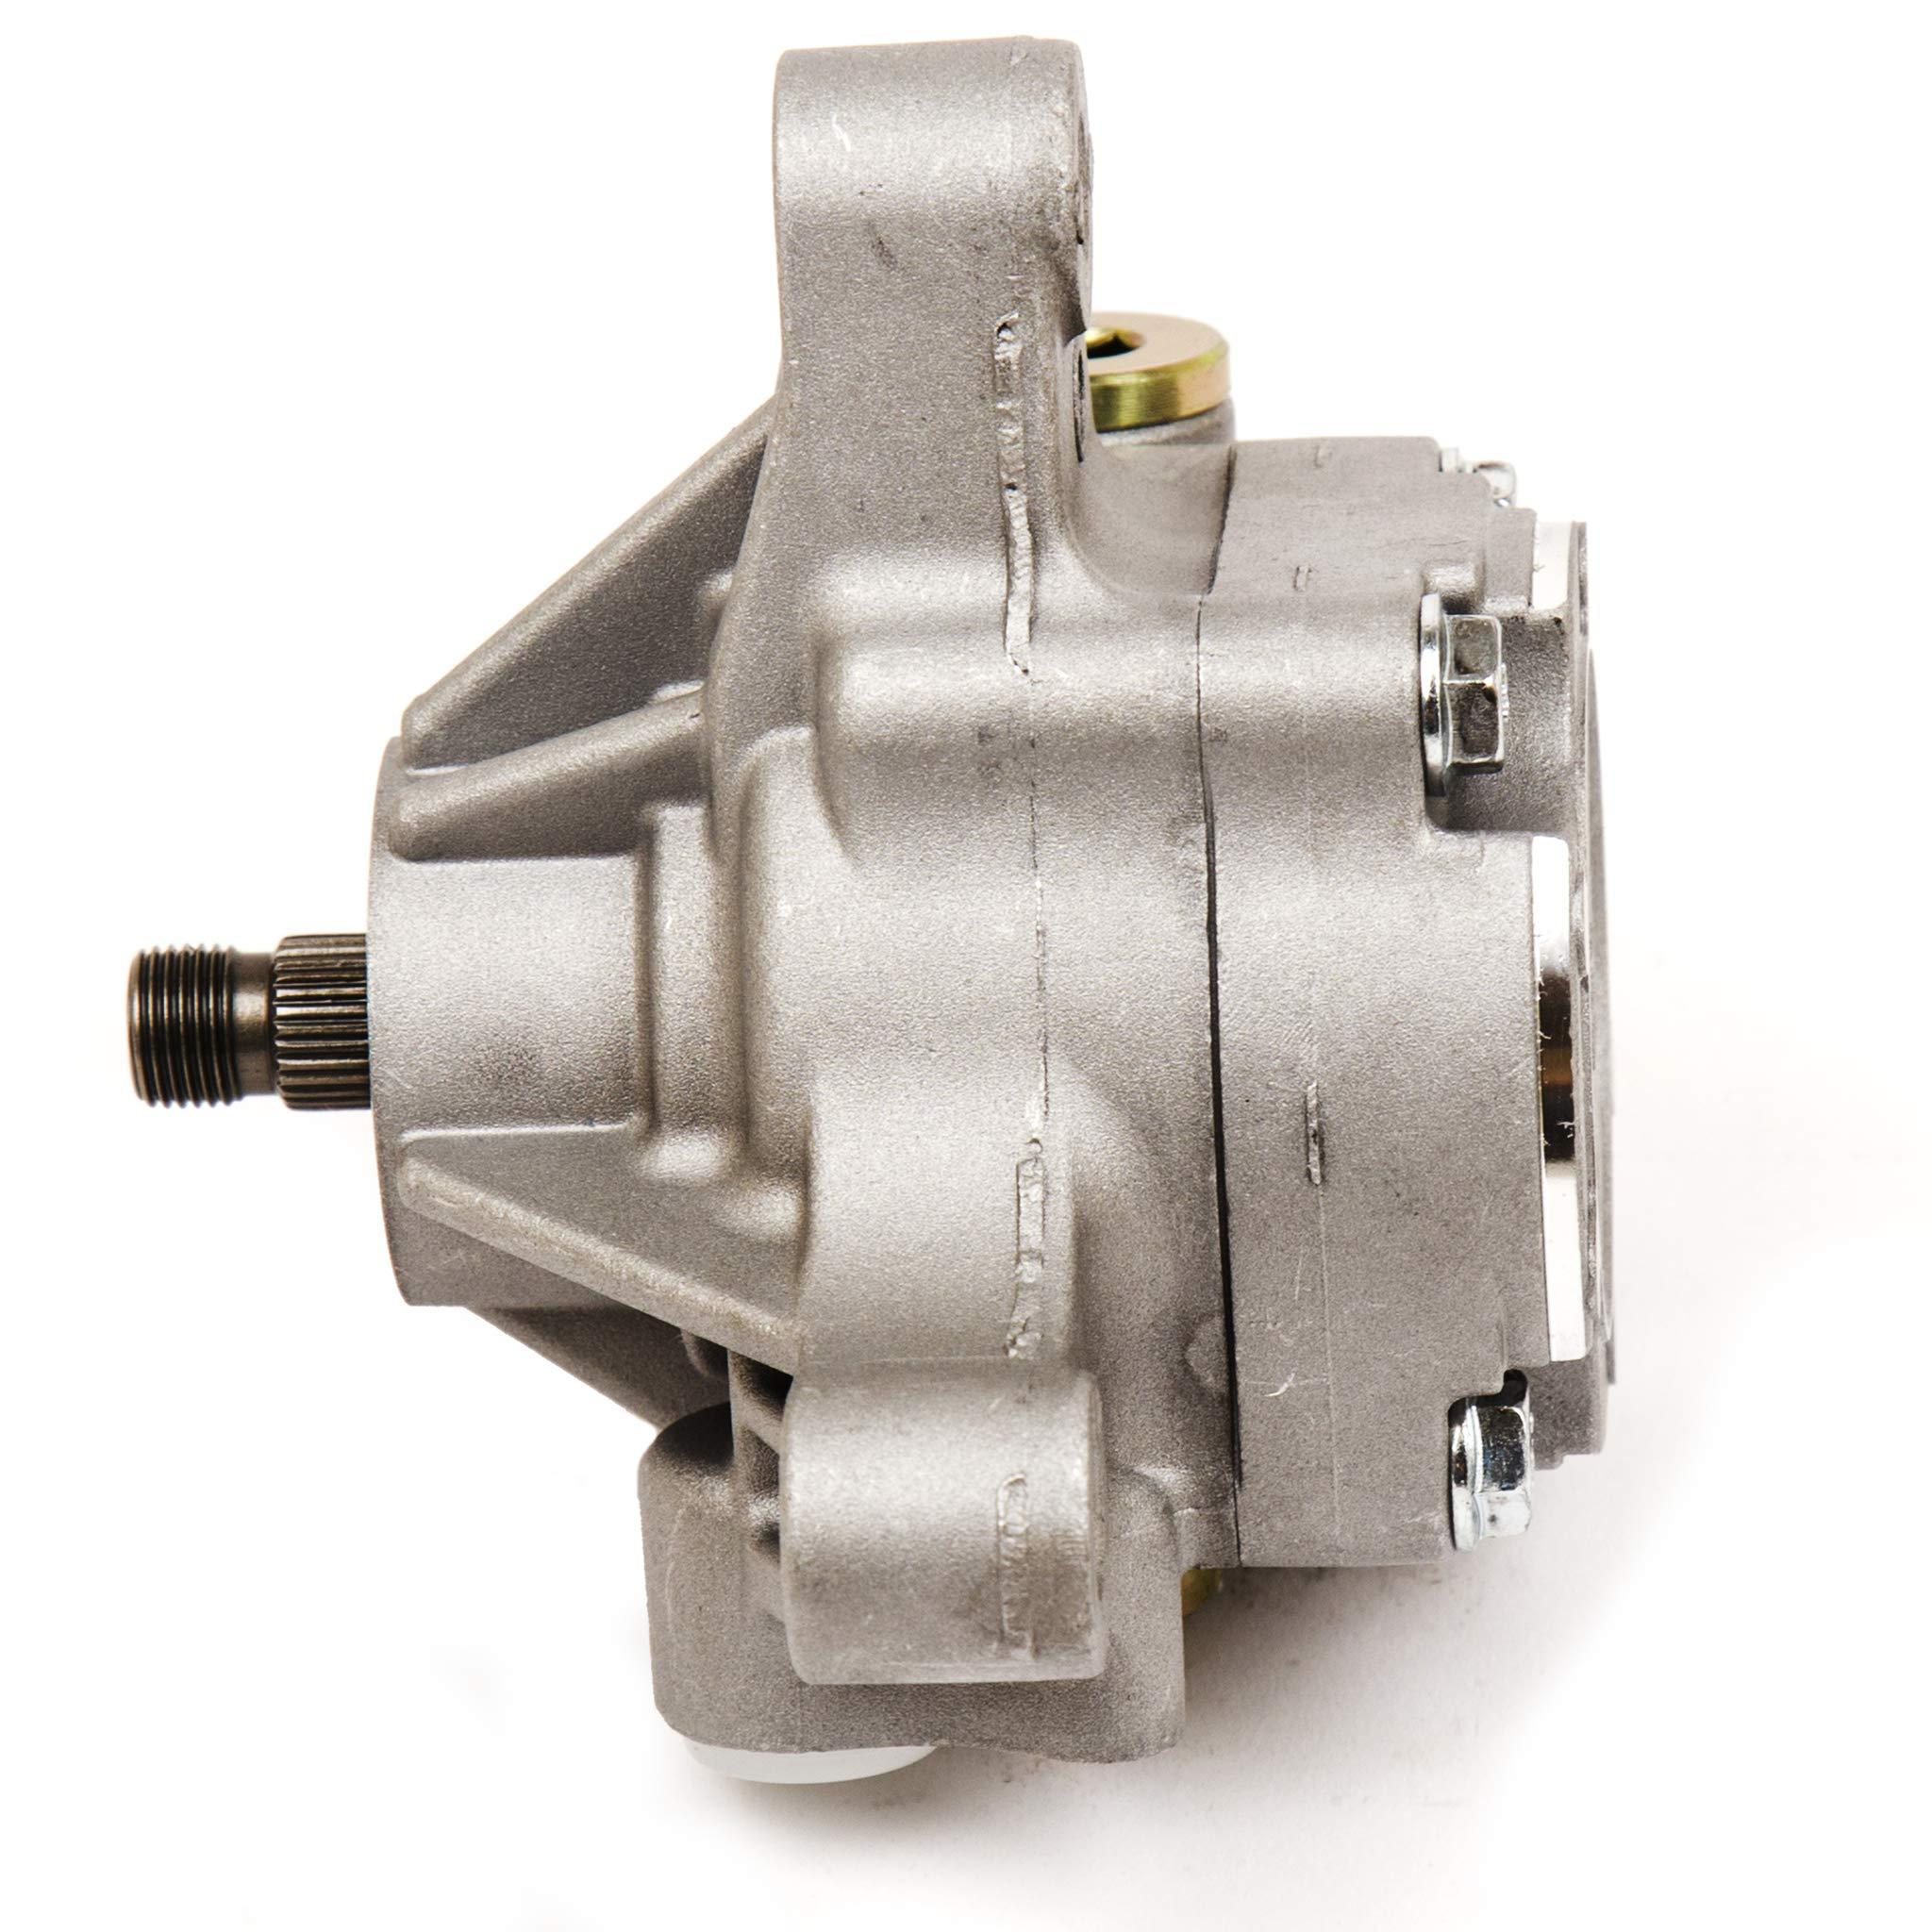 Well Auto 21-5348 New Power Steering Pump 03-04 Honda CR-V 2.4L 03-05 Honda Element 2.4L